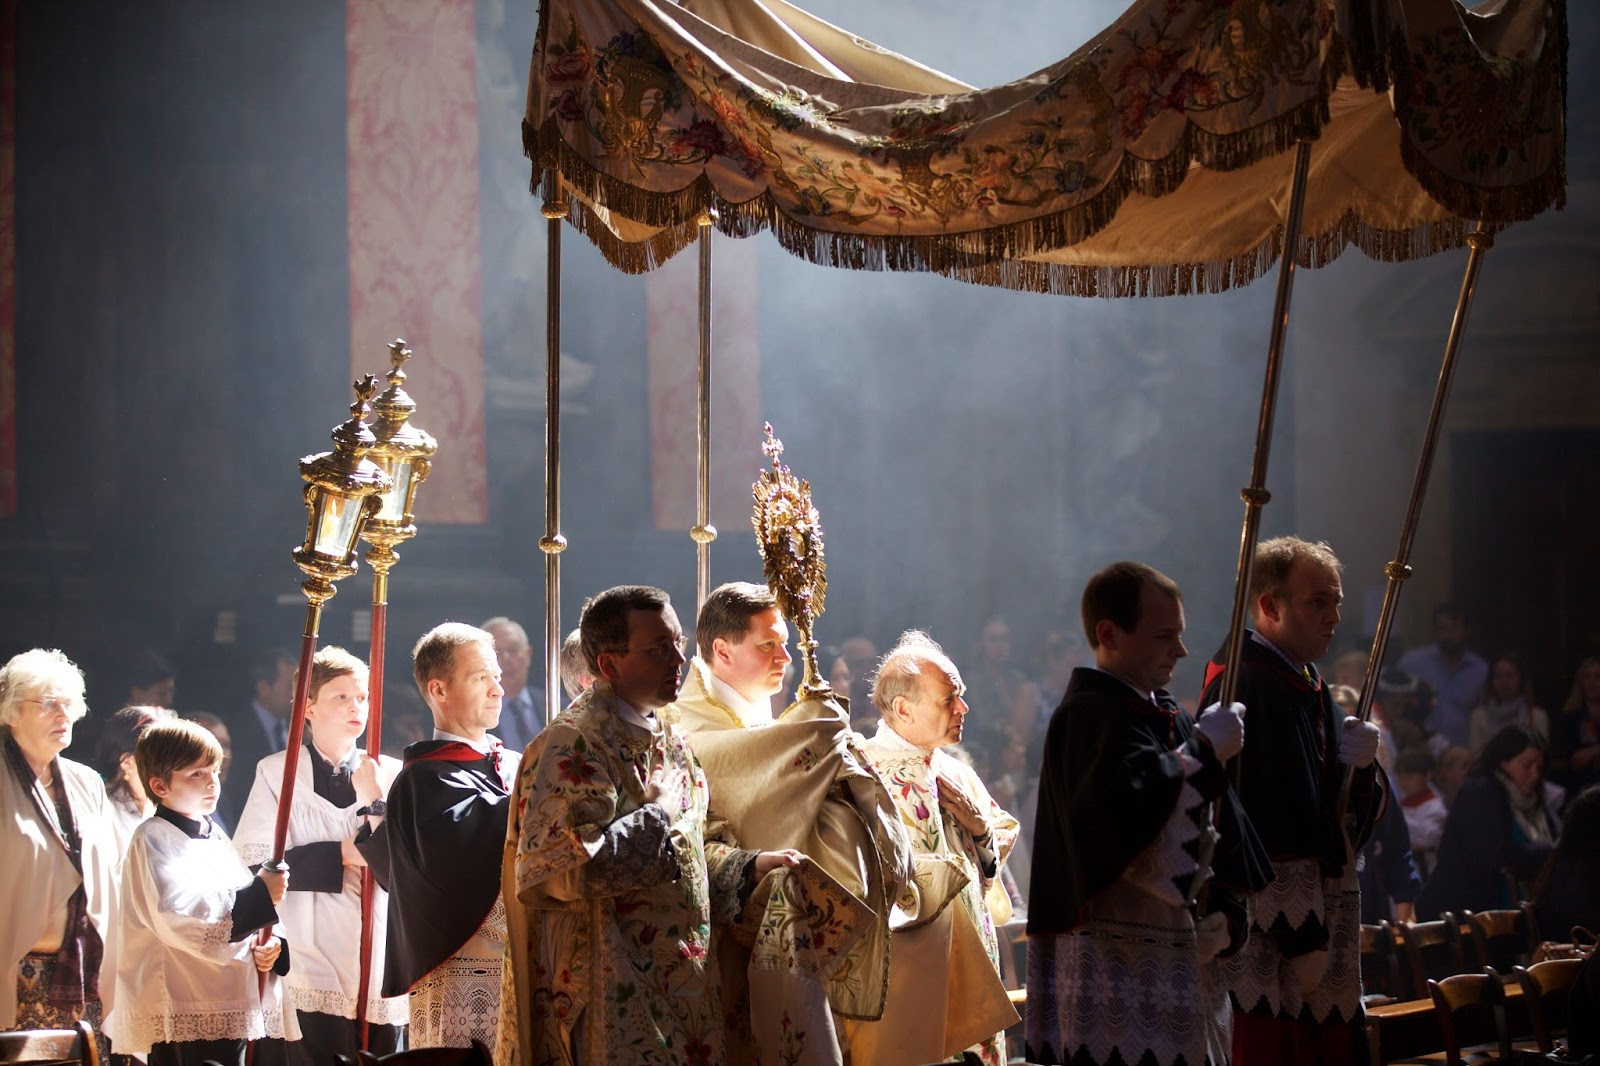 Corpus Christi at Santissima Trinità dei Pellegrini